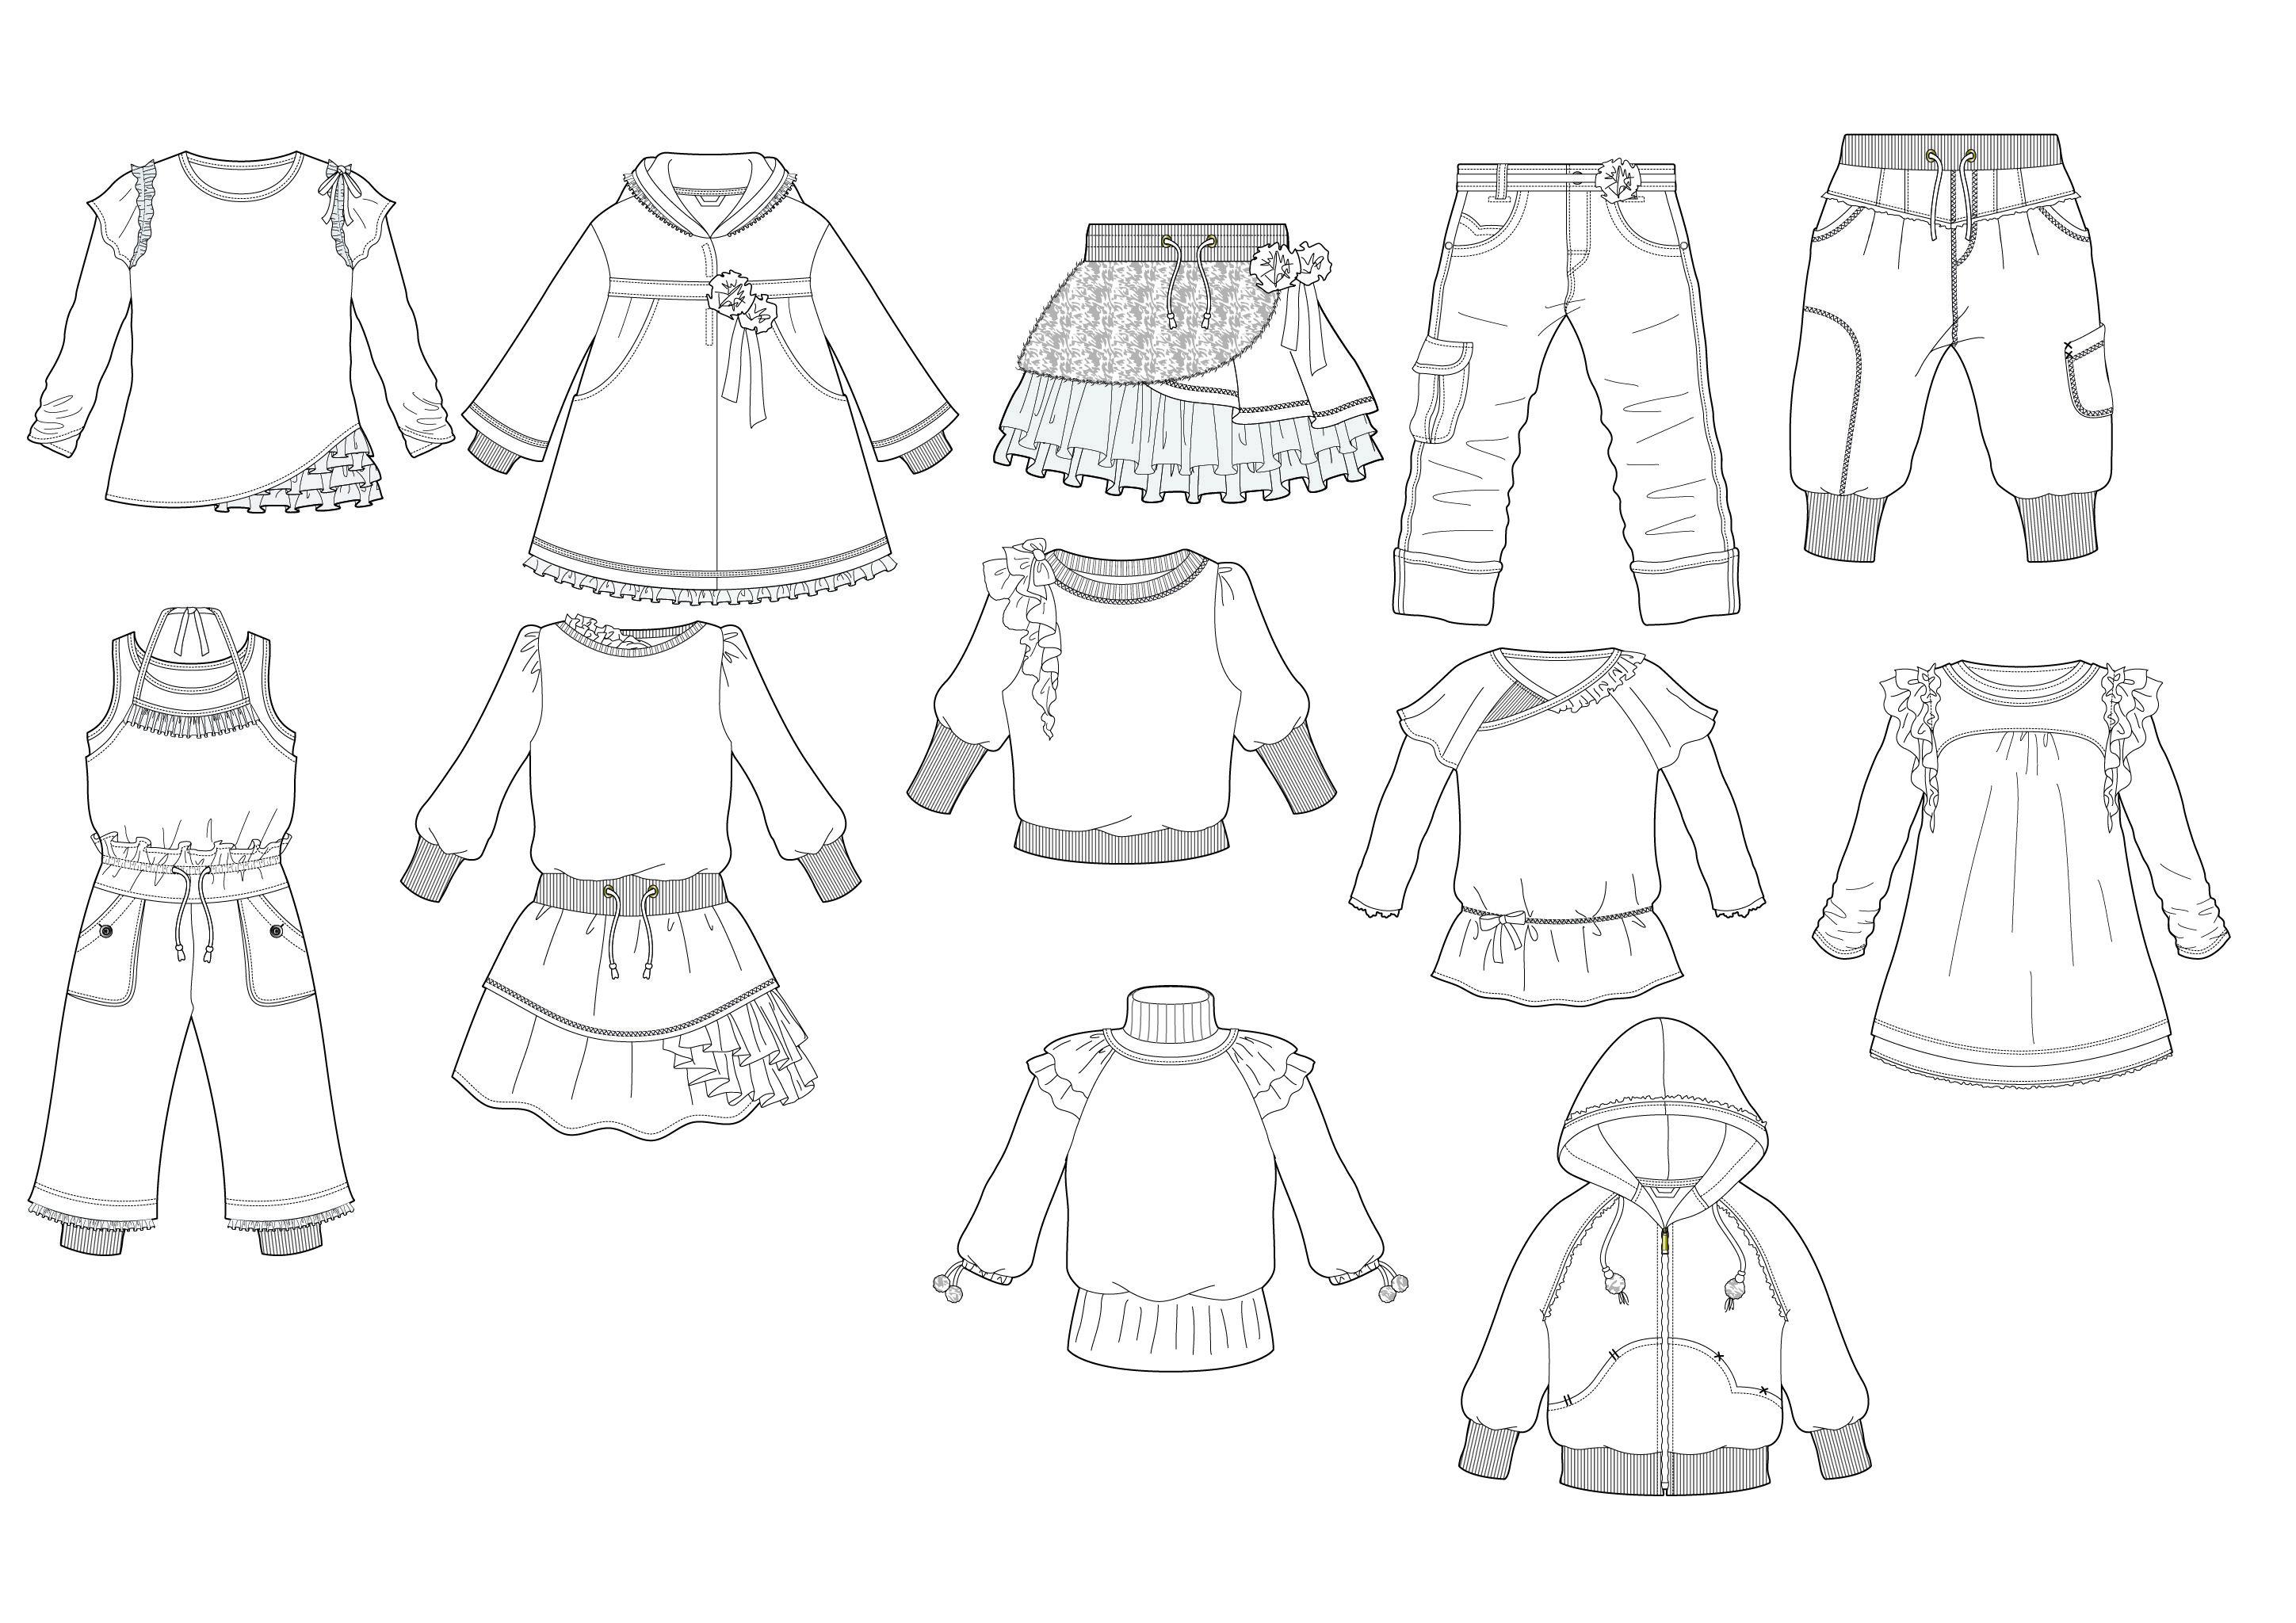 Printable Clothes Templates For Kids   Fashion Design Flat Sketches - Free Printable Fashion Model Templates